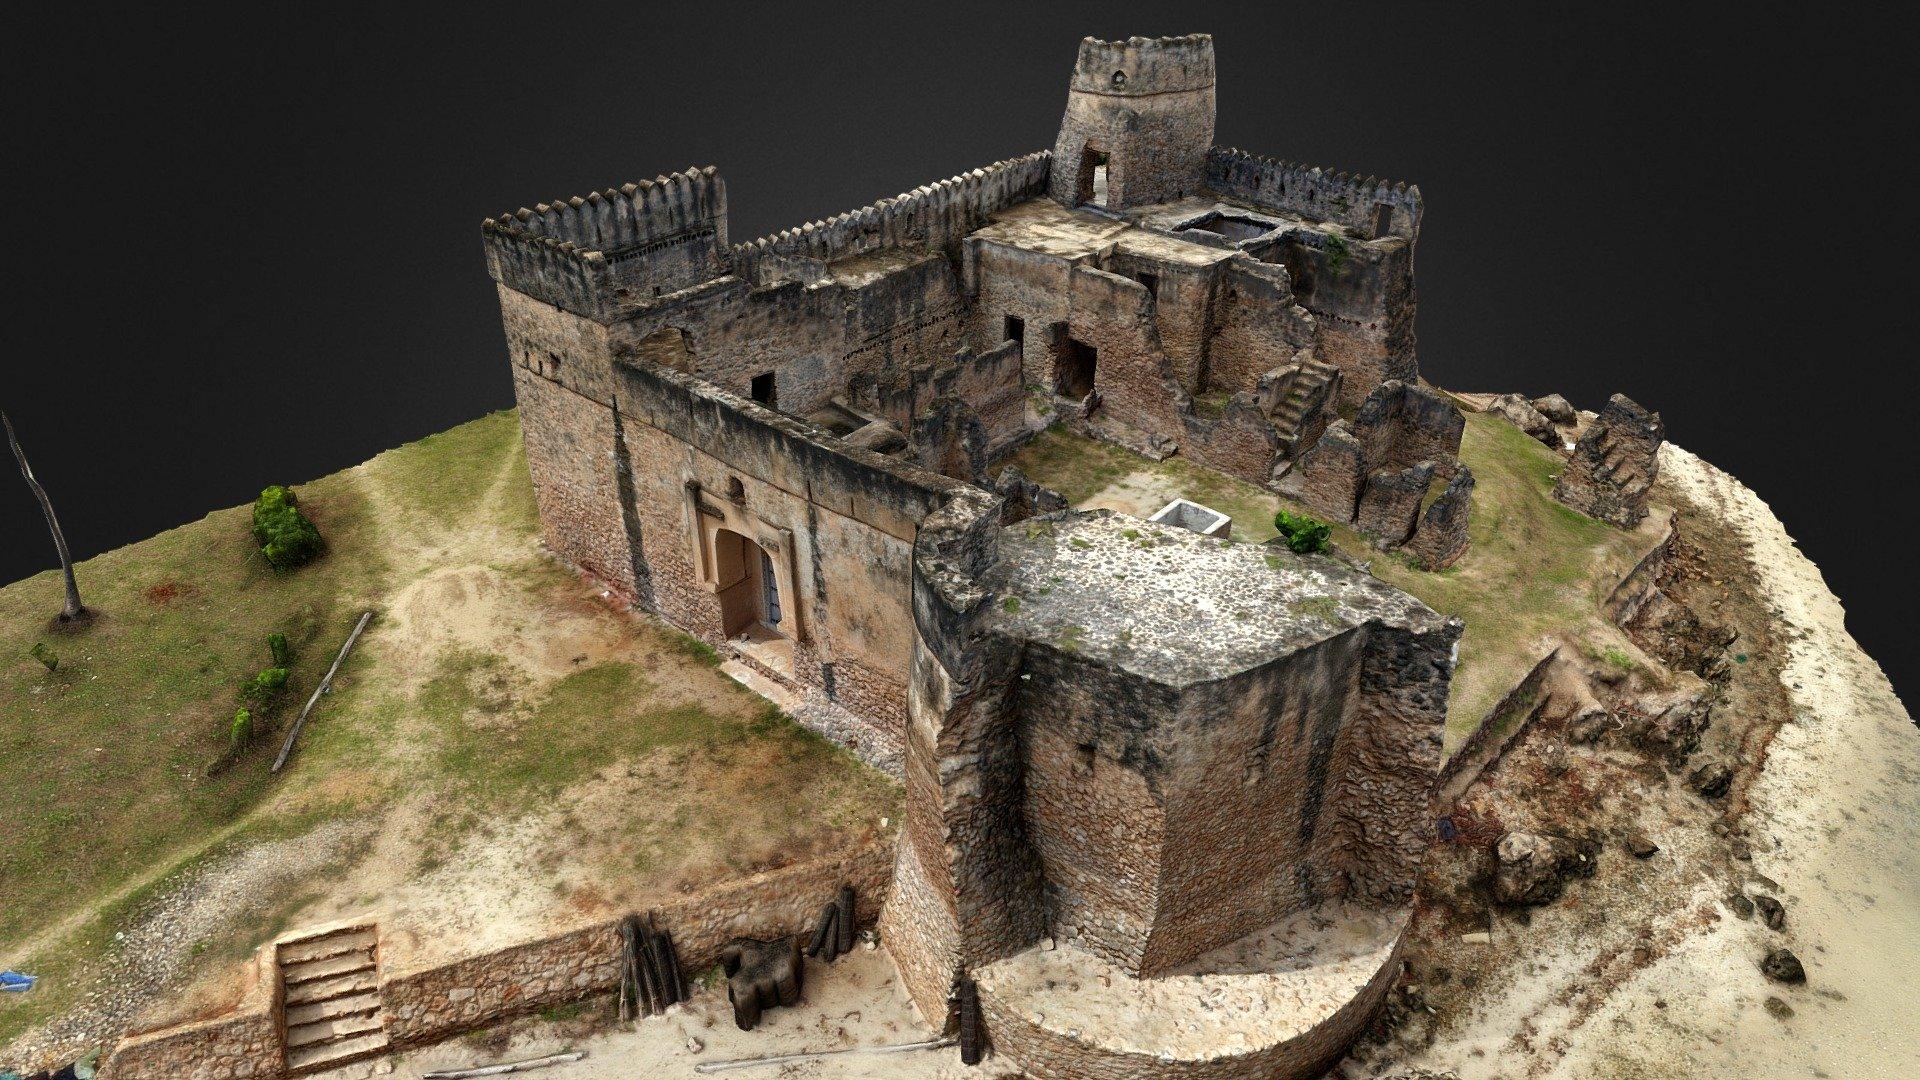 Gerezani fort Kilwa Kisiwani Tanzania   Download 3D model 1920x1080